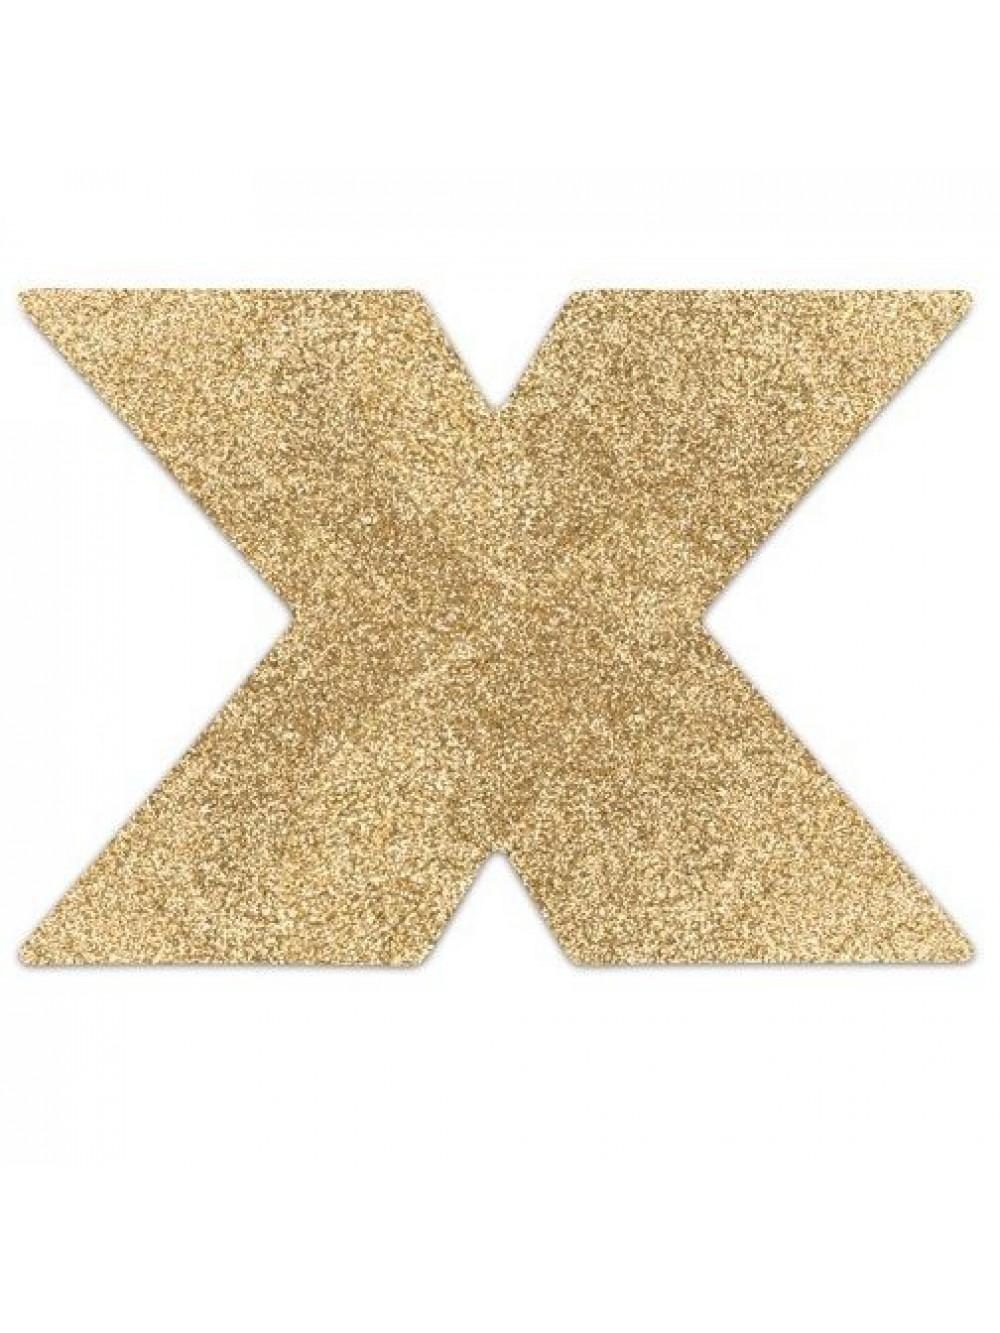 BIJOUX PEZONERAS FLASH CROSS GOLD 8437008003702